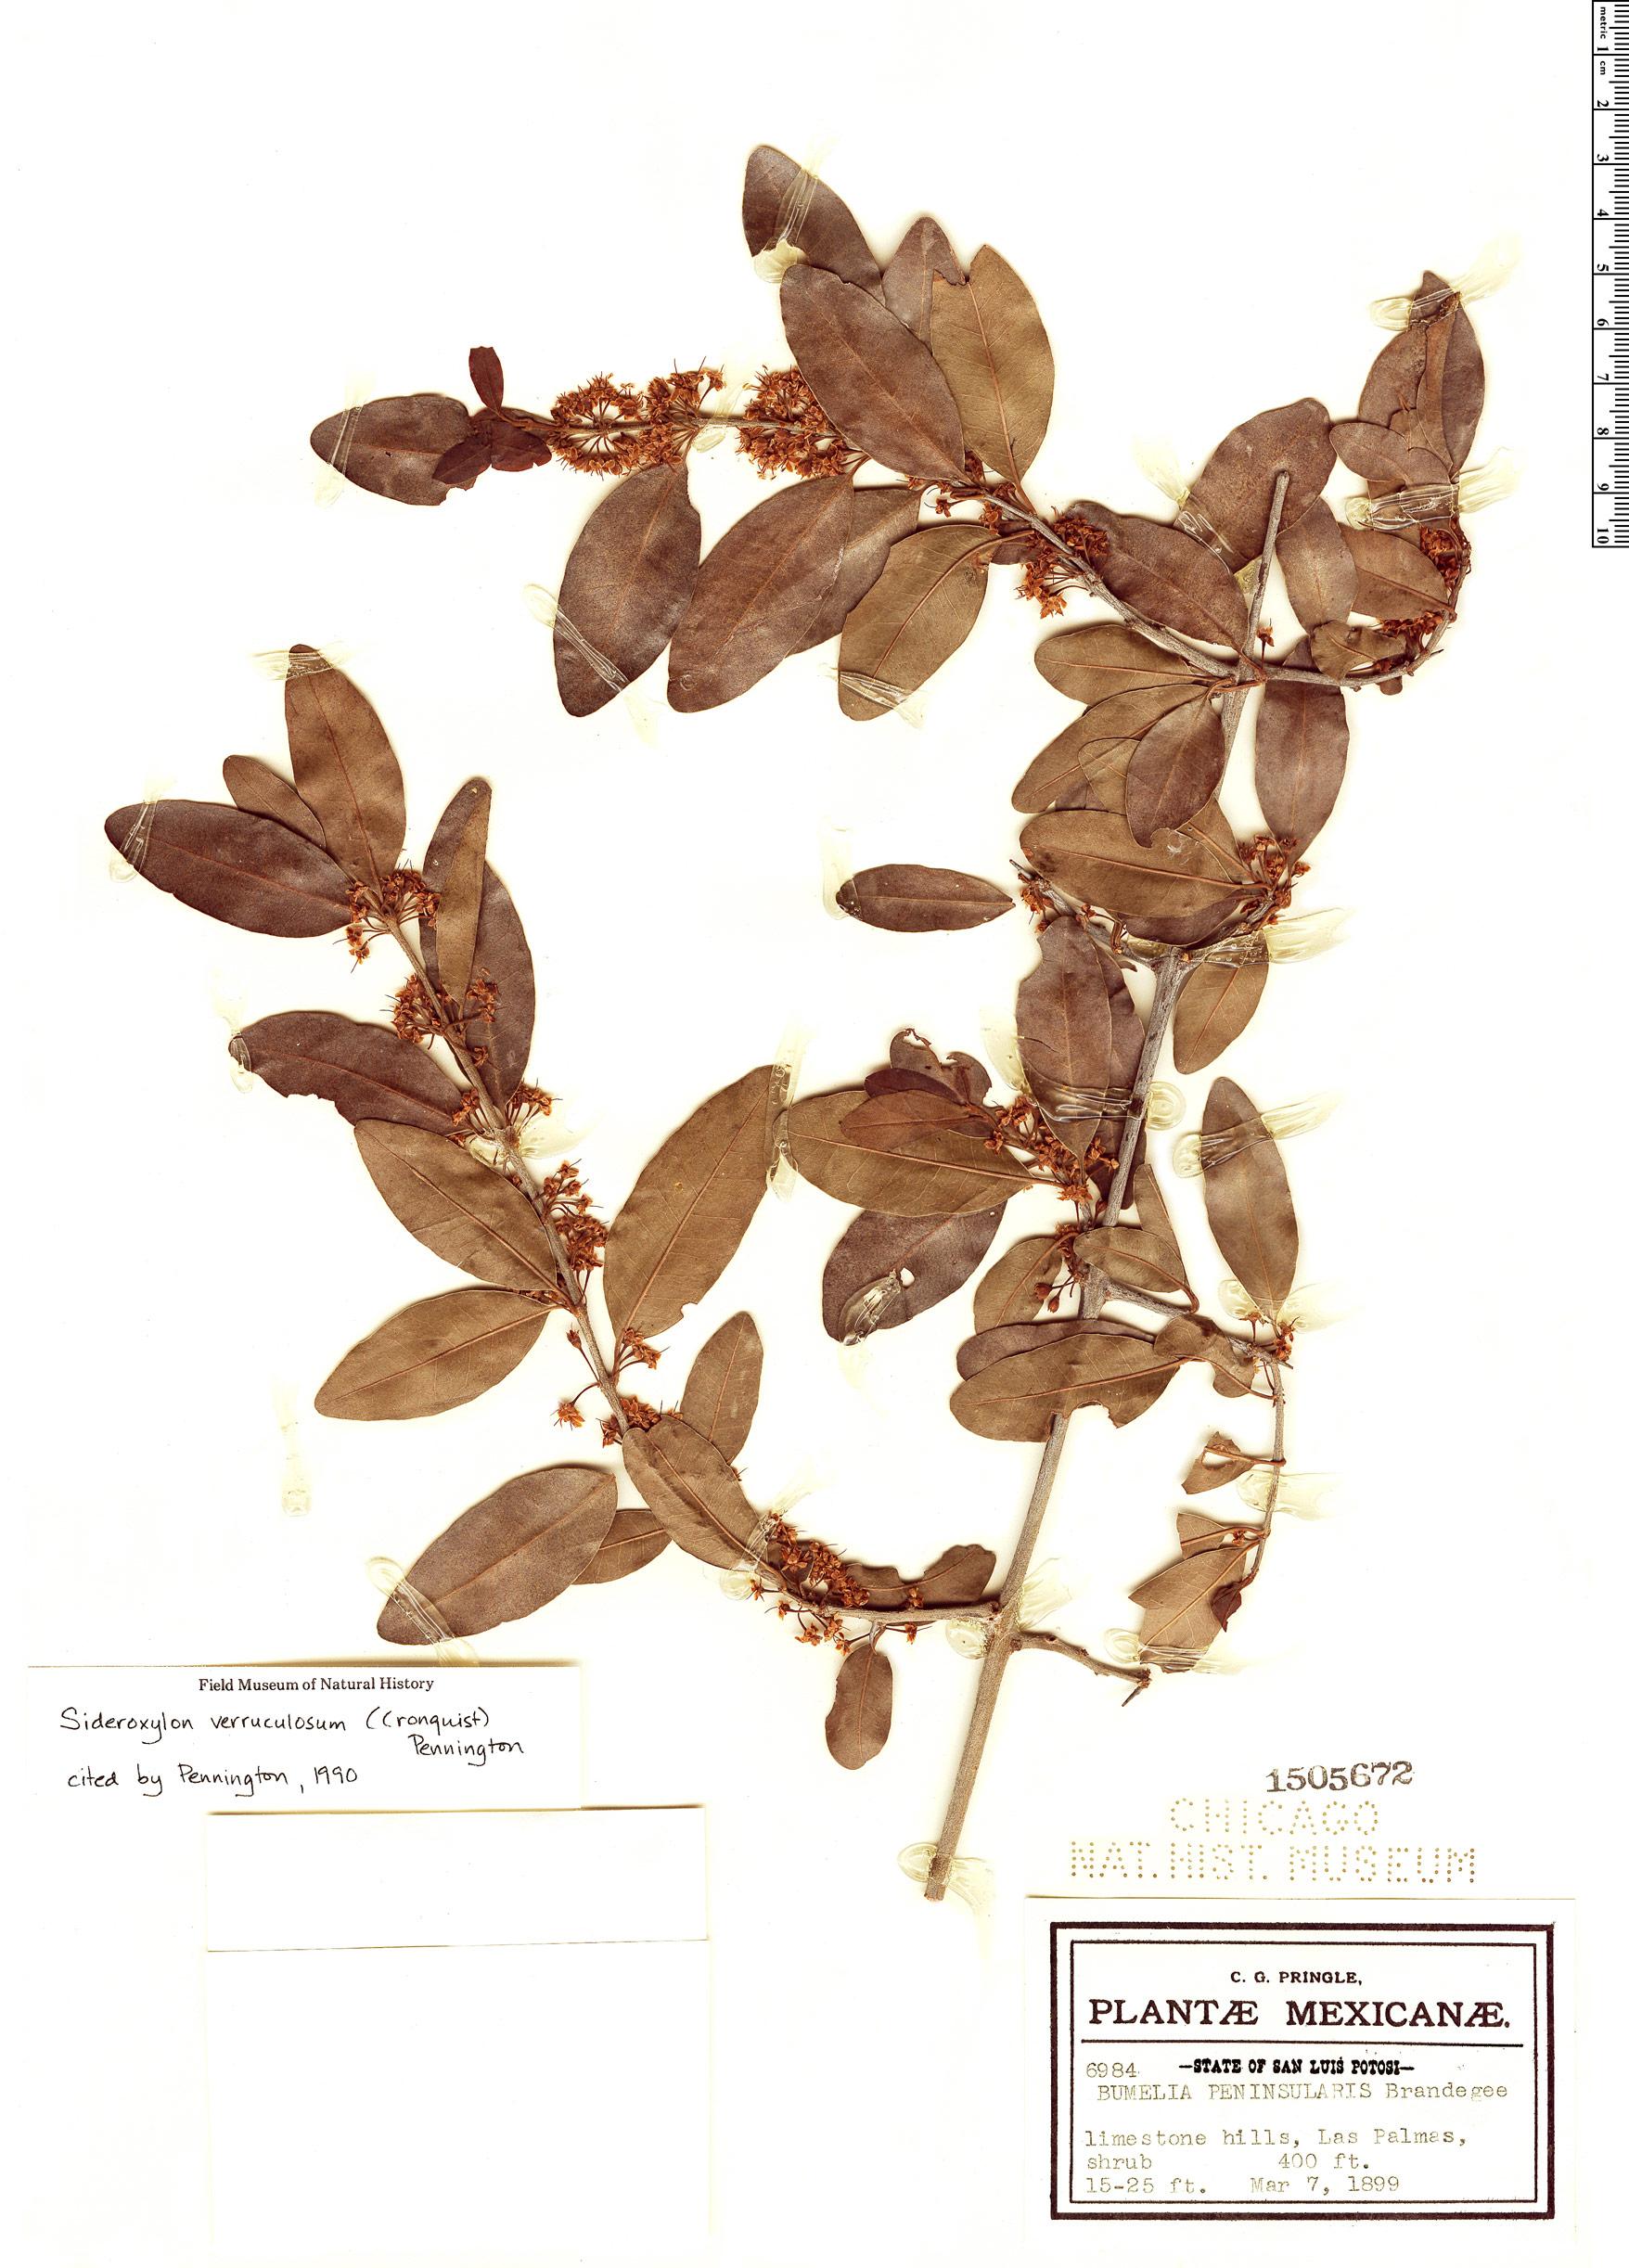 Specimen: Sideroxylon verruculosum